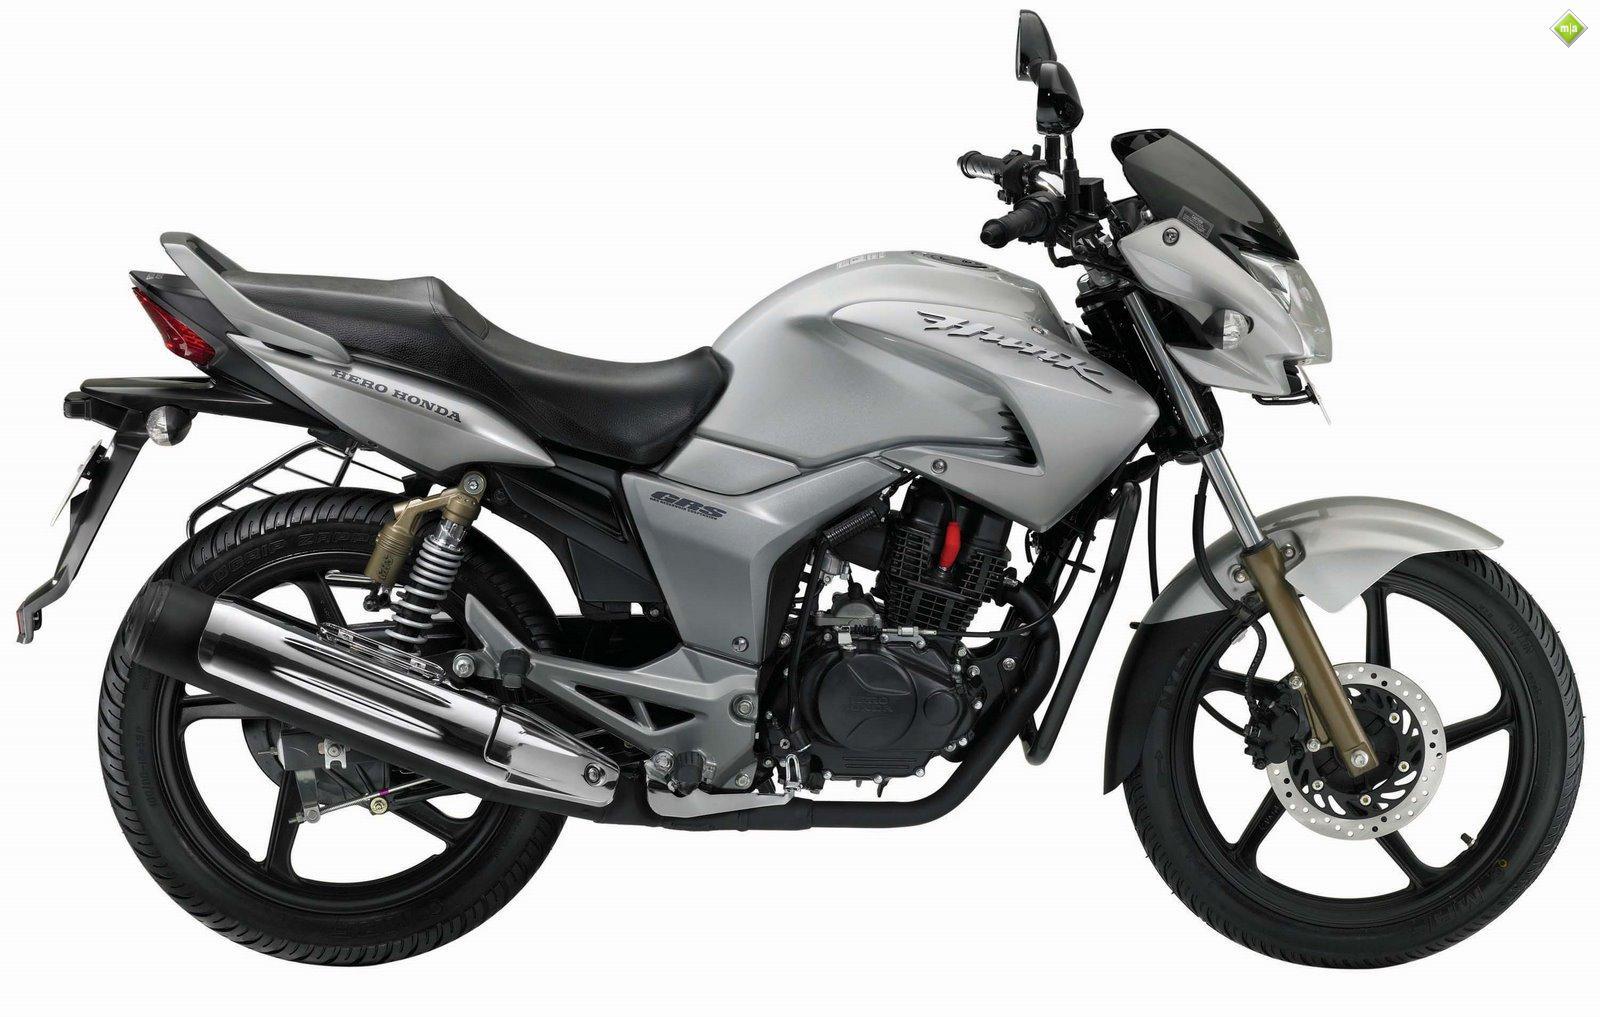 Hero Honda Prices List In Bangladesh 2013 Motorcycles Price